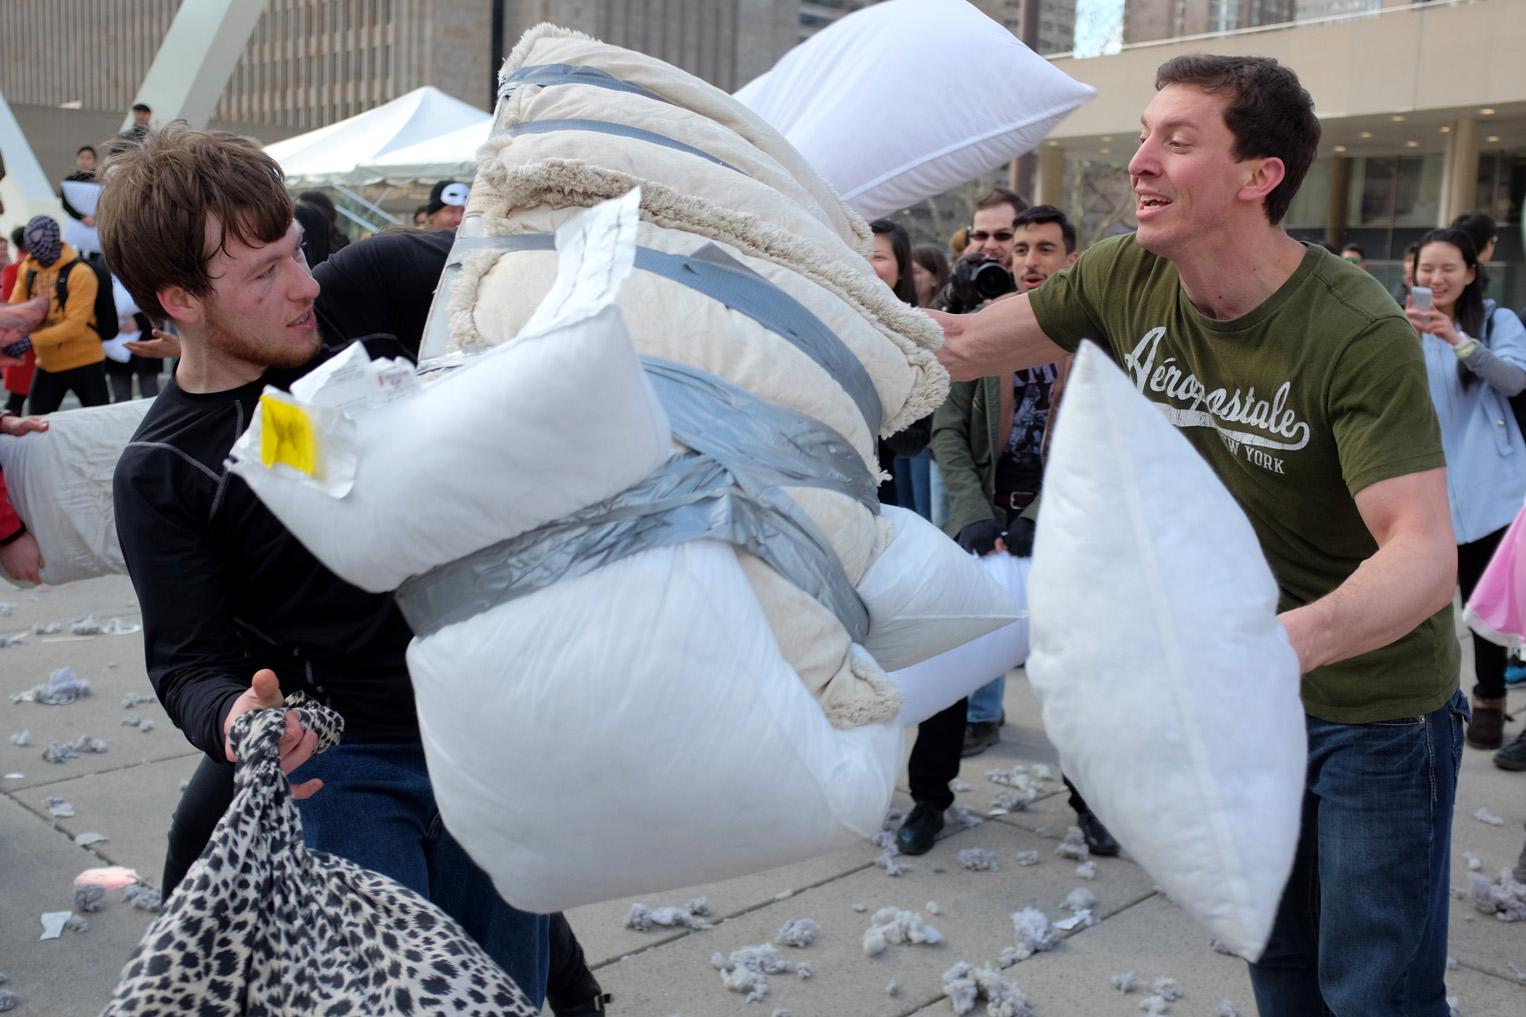 Pillow Fight-100dpi-19.jpg